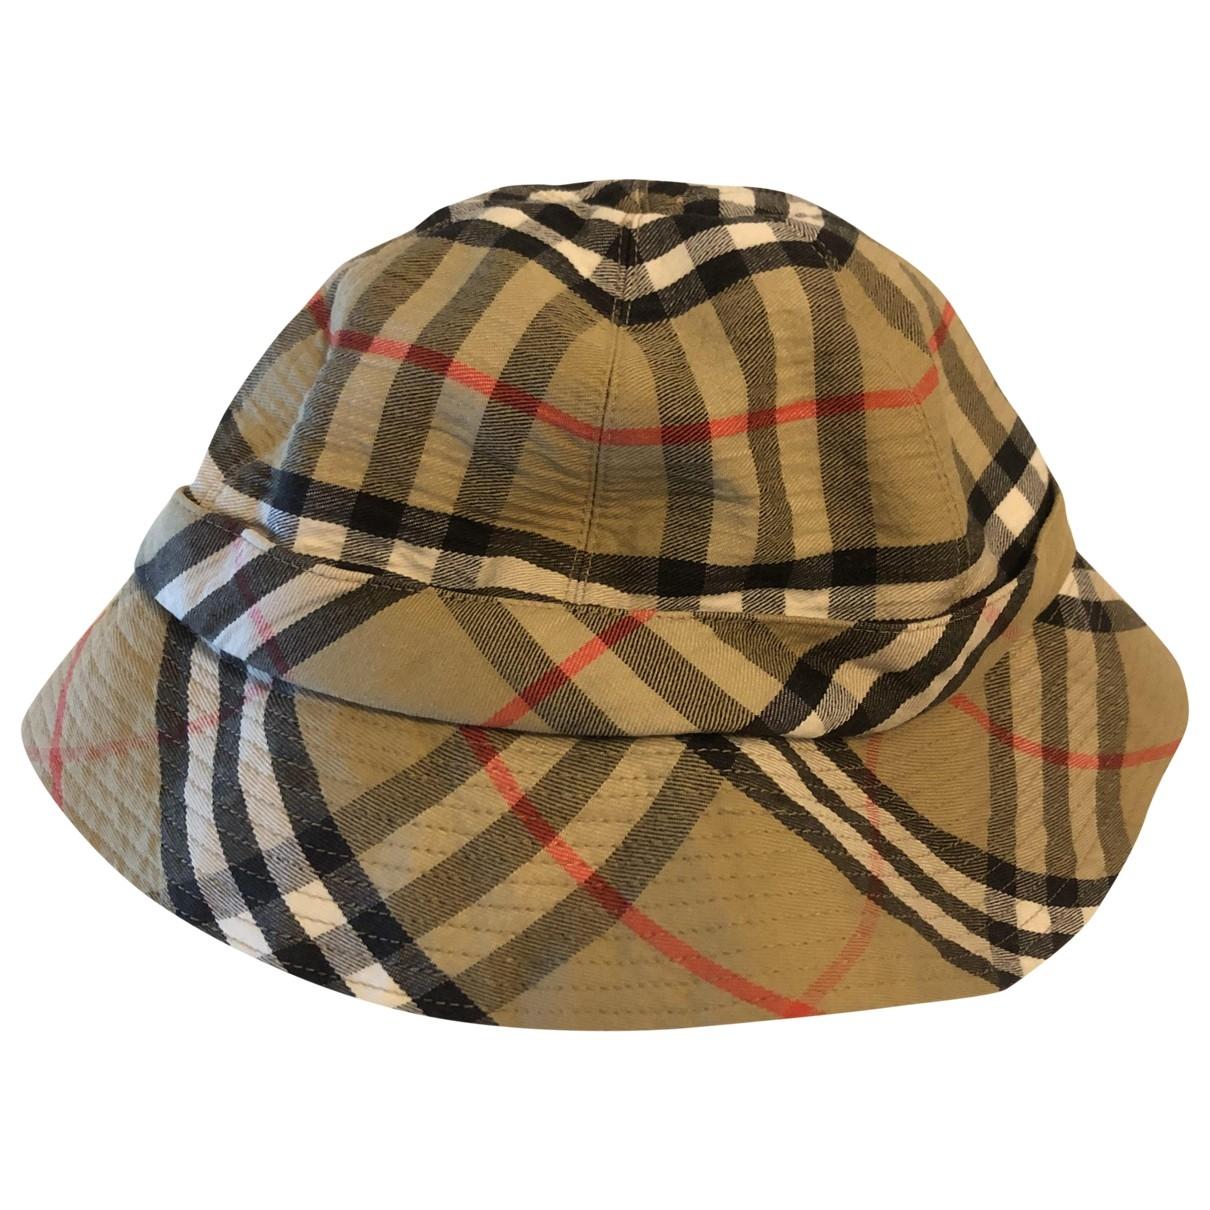 Burberry \N Camel Cotton hat & Gloves for Kids \N